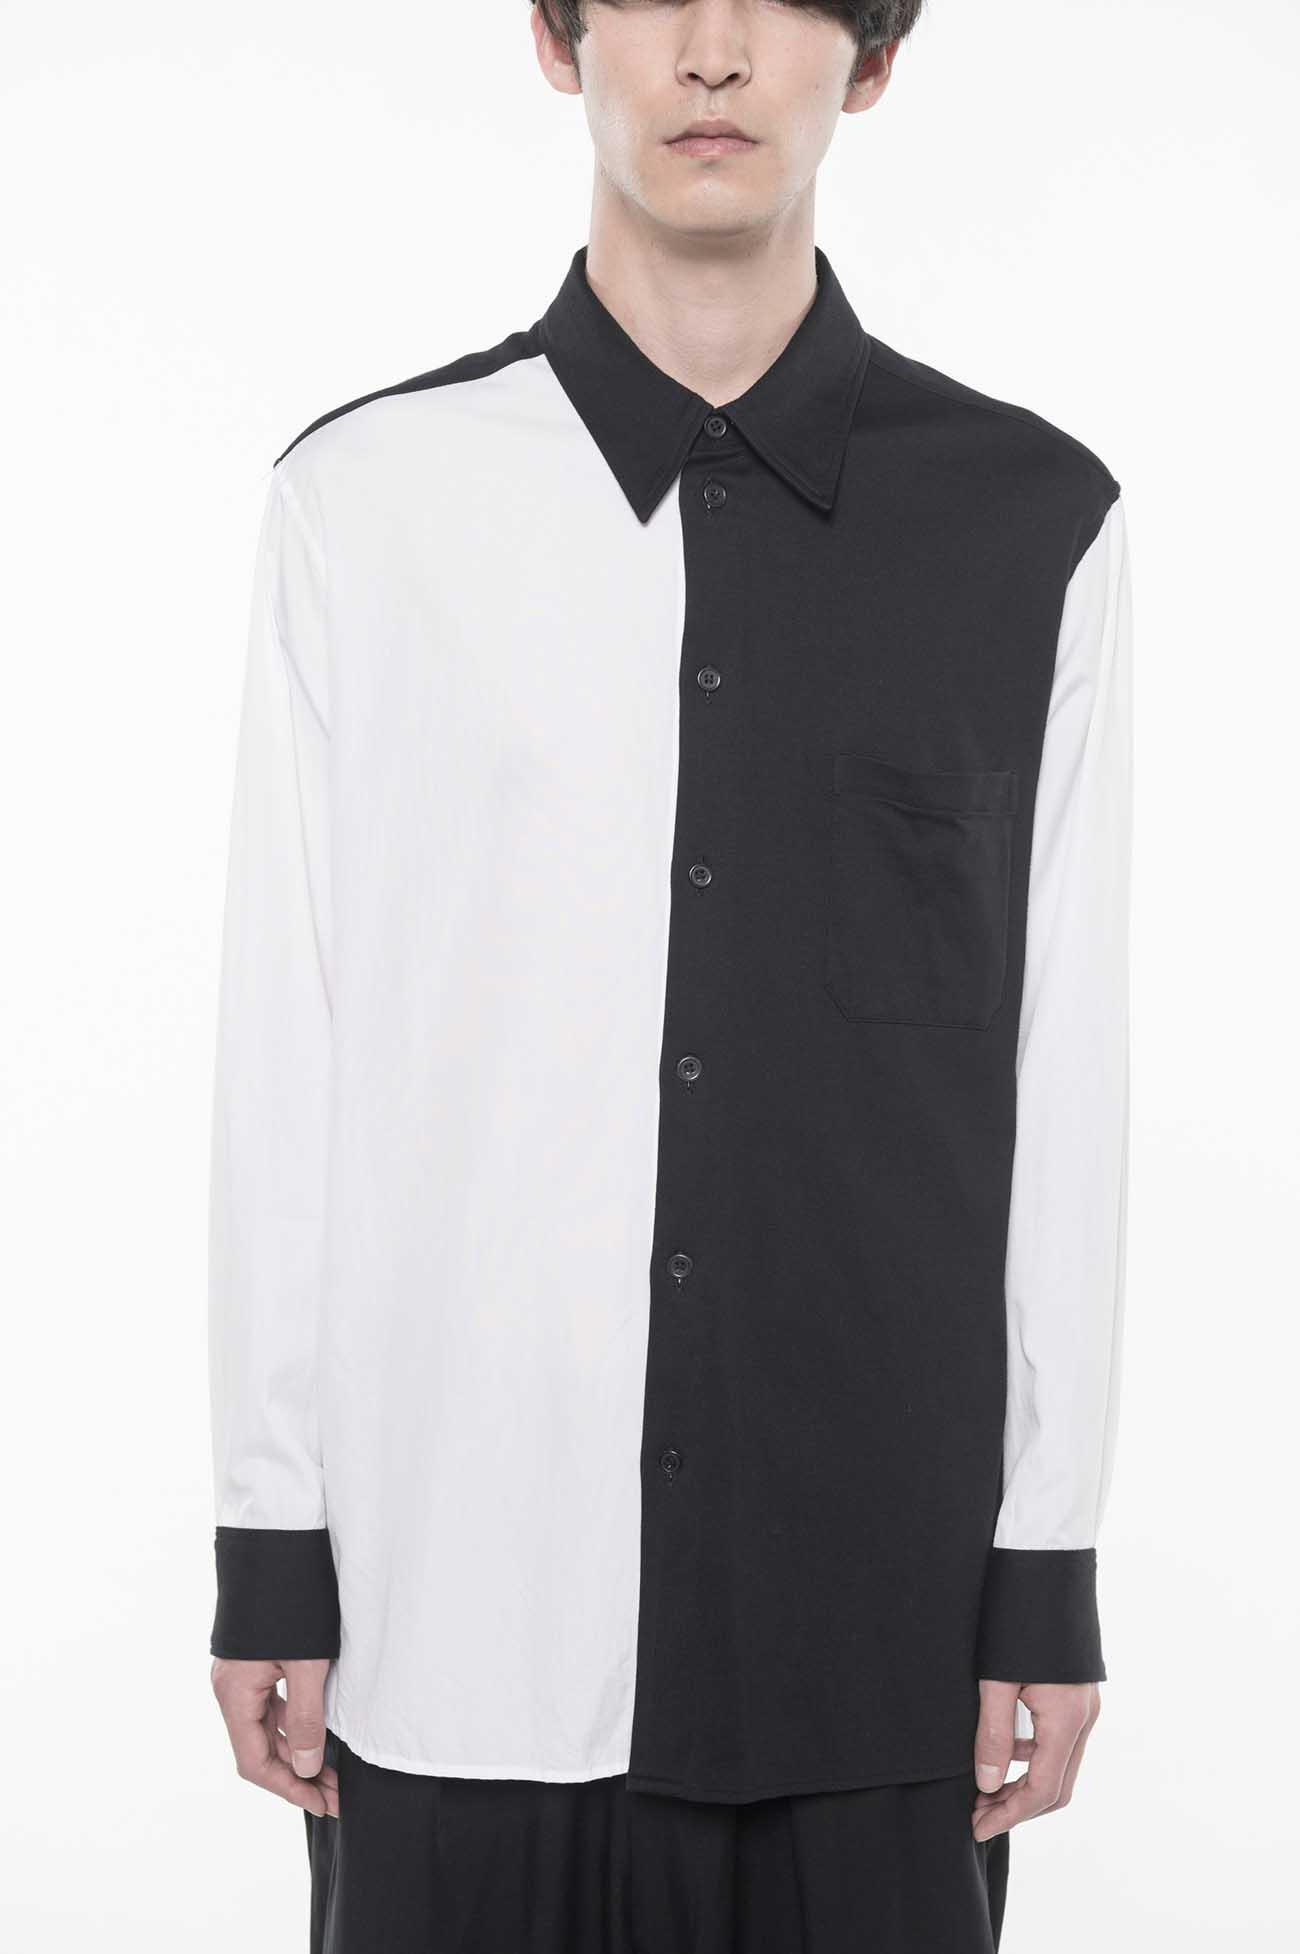 100/2 Broad /40/2 Cotton Jersey Regular Collar Two-tone Panel Shirt